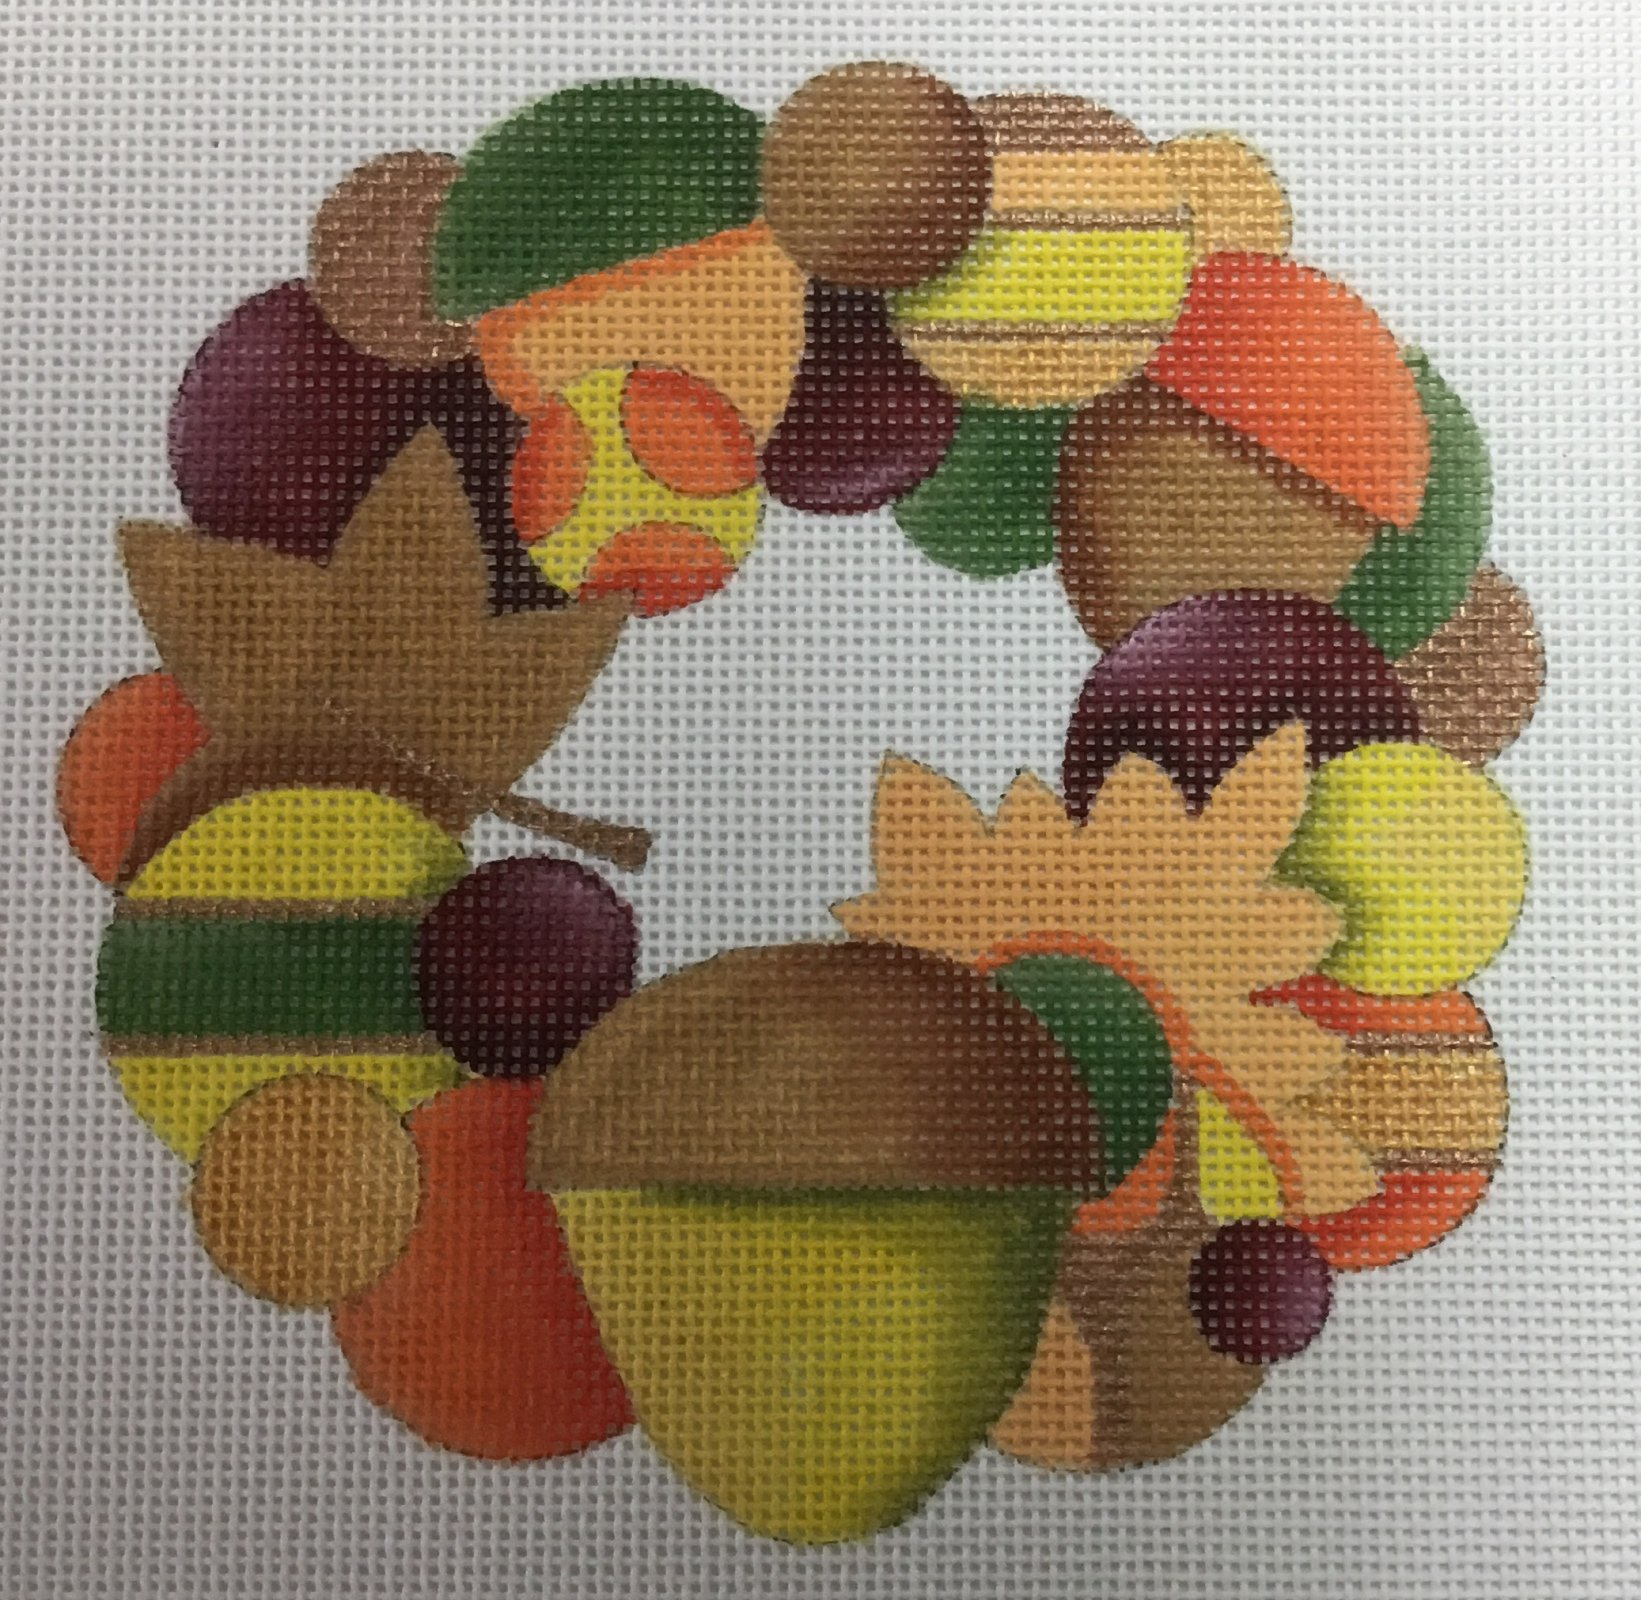 Acorn Wreath, 5x5, 18M